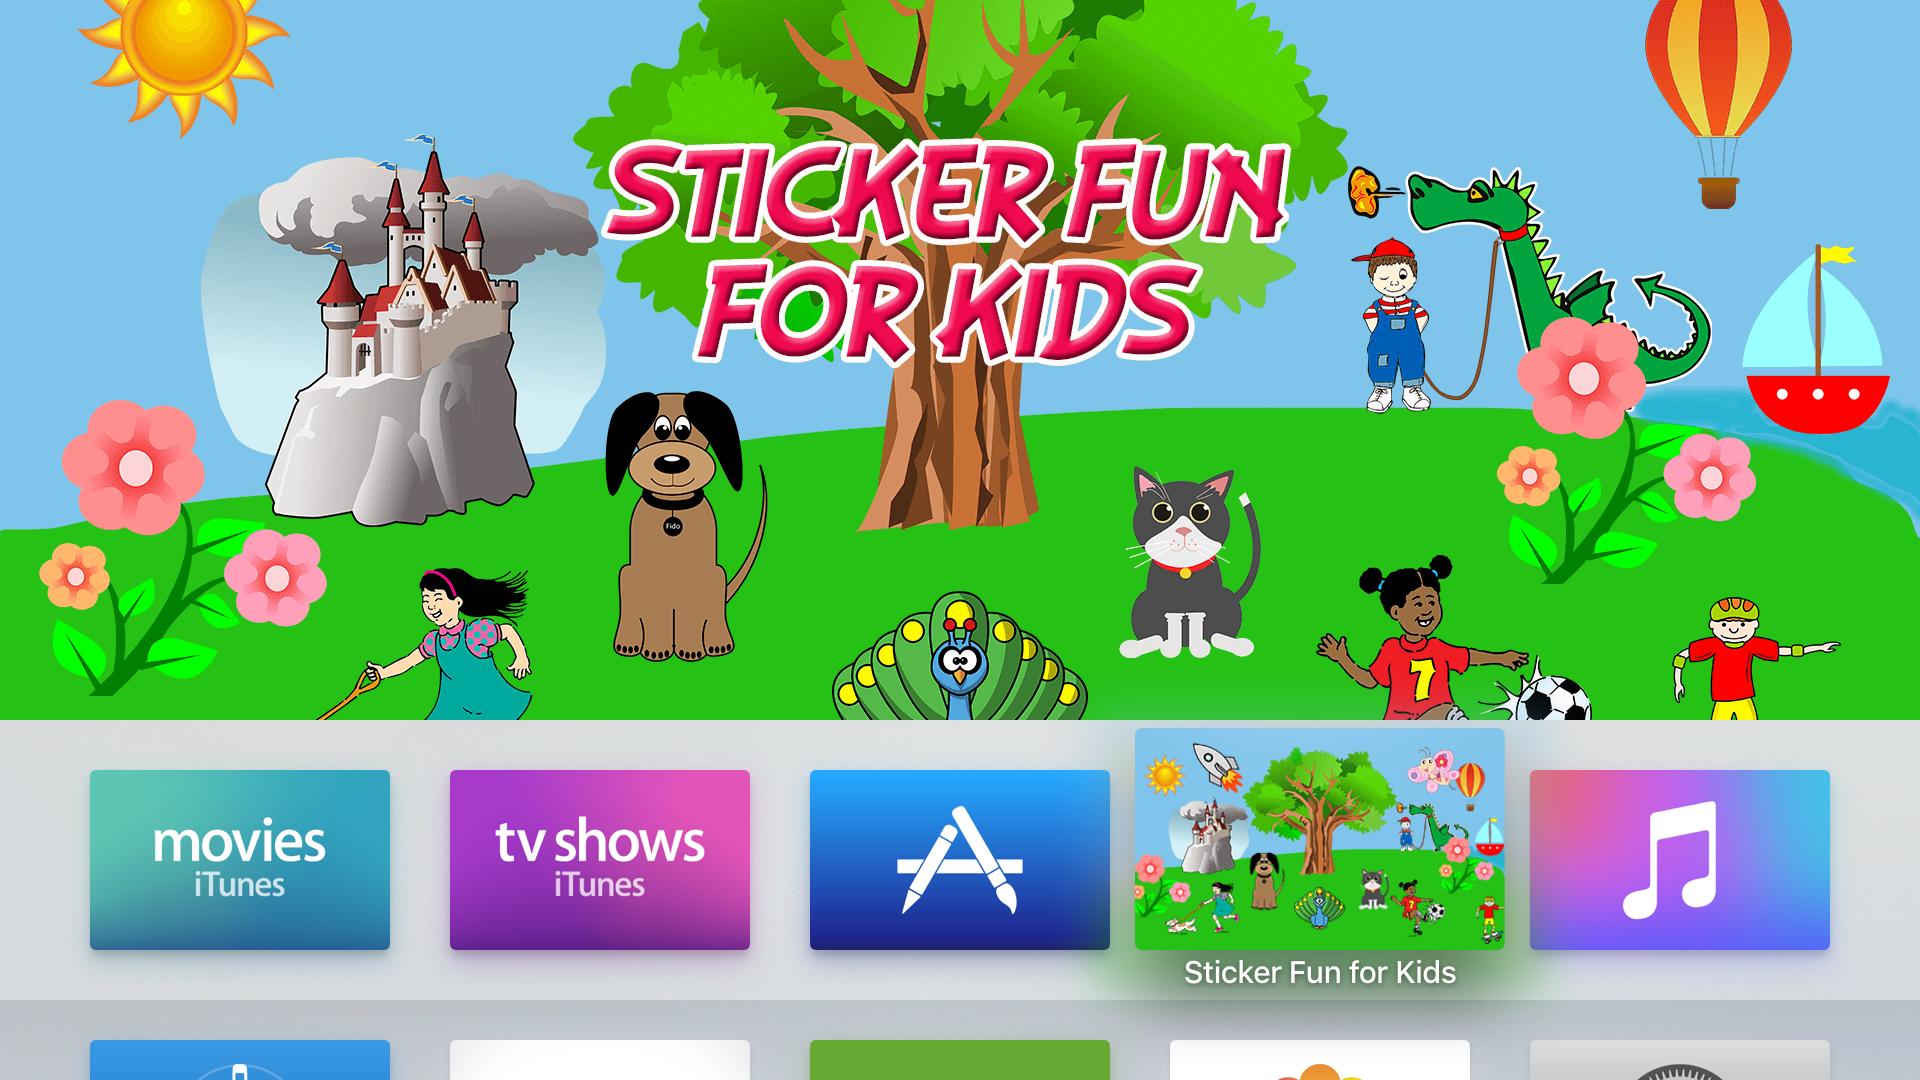 Sticker Fun for Kids on Apple TV®